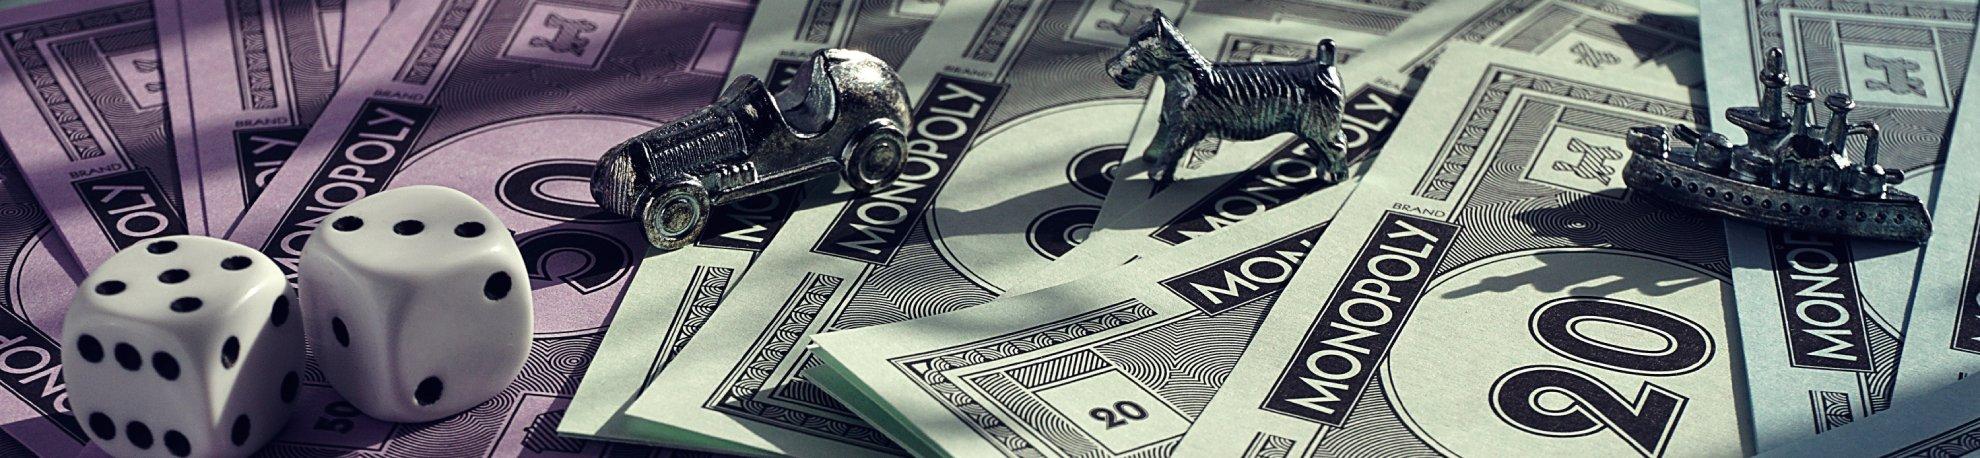 nu-deschiderea-procedurii-de-insolventa-trebuie-sa-constituie-motiv-de-excludere-de-la-licitatie